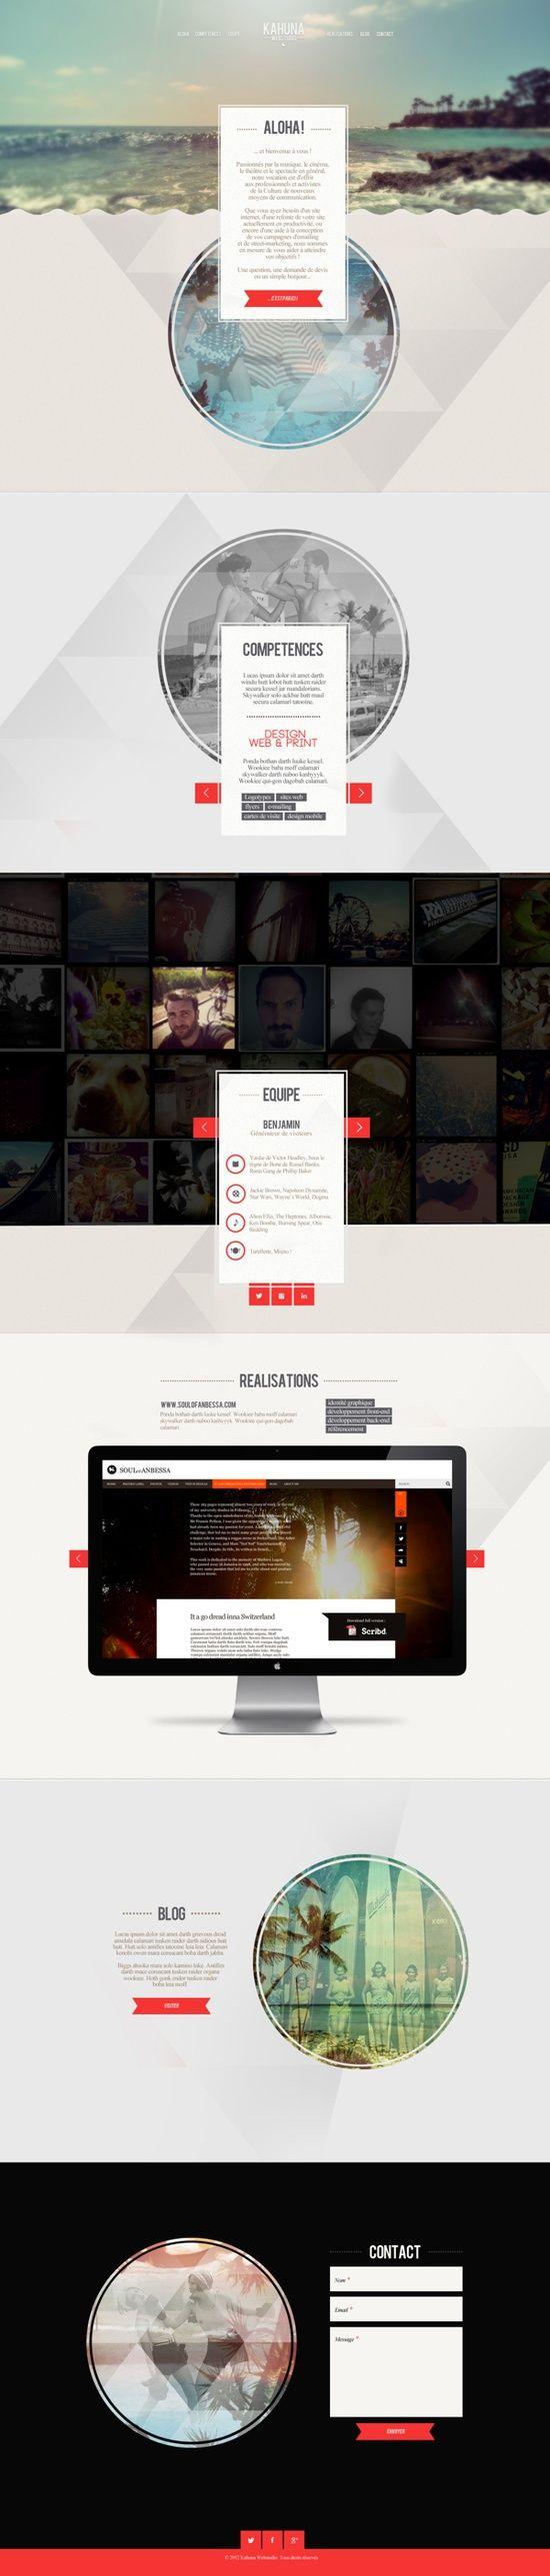 beautiful inspiration #graphicdesign #webdesign